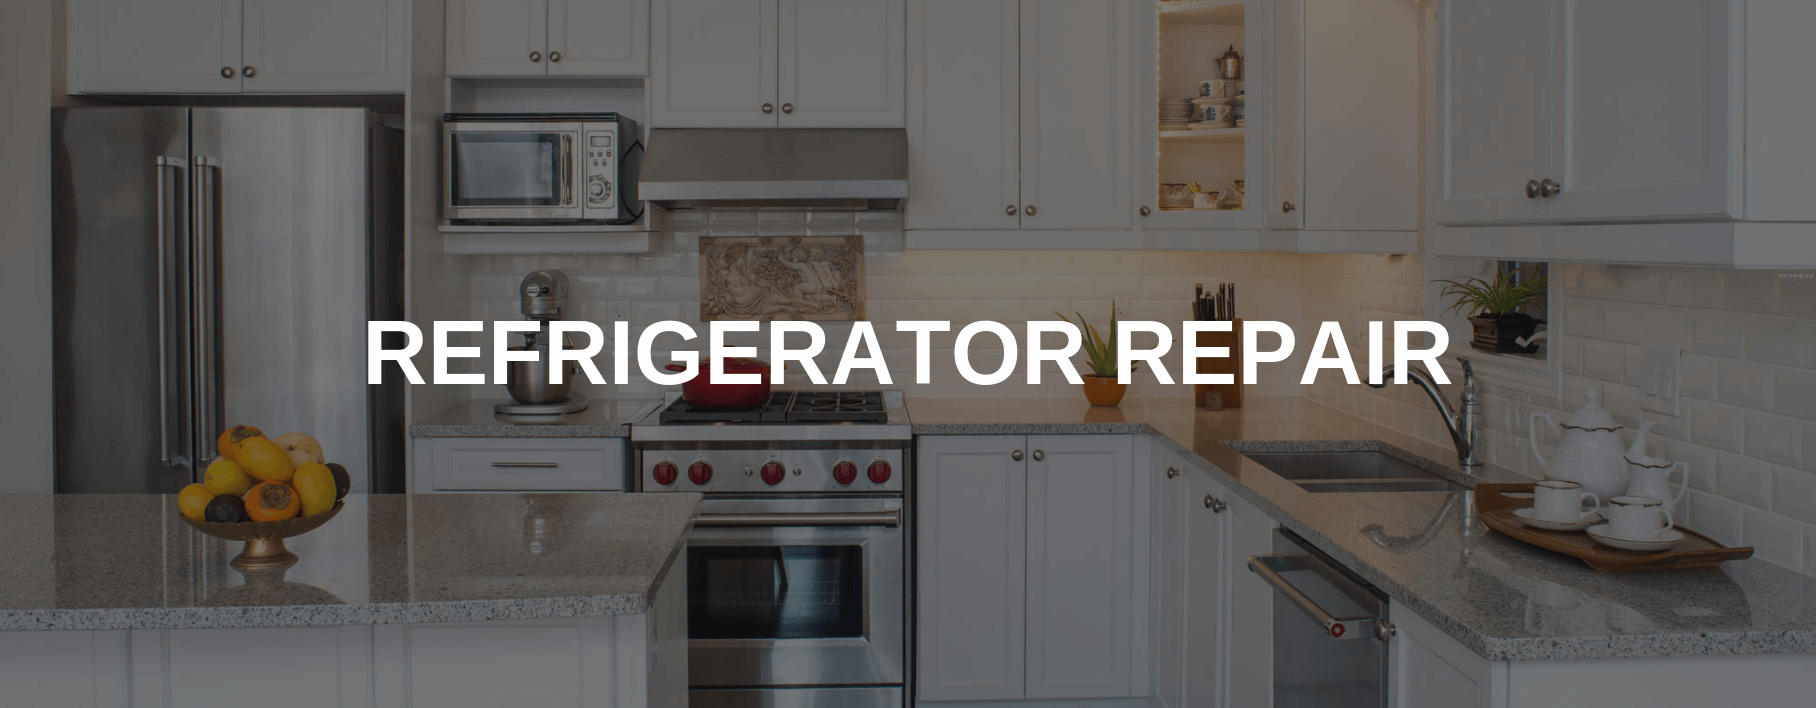 refrigerator repair groton